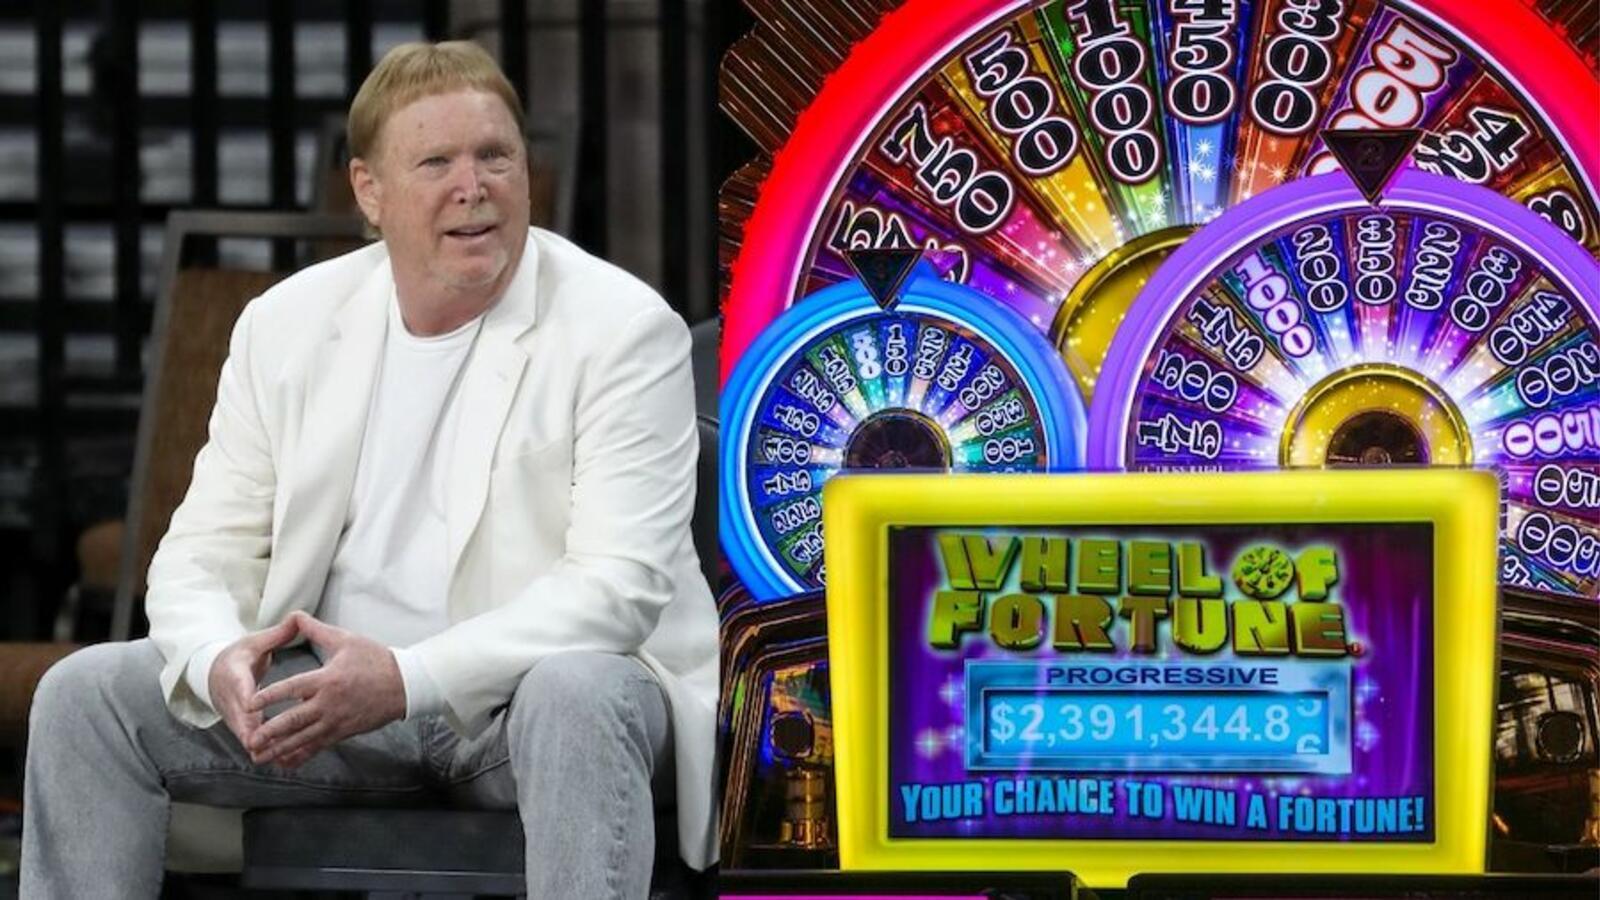 Raiders Owner Mark Davis, Worth $500 Million, Has Big Win On Slot Machine